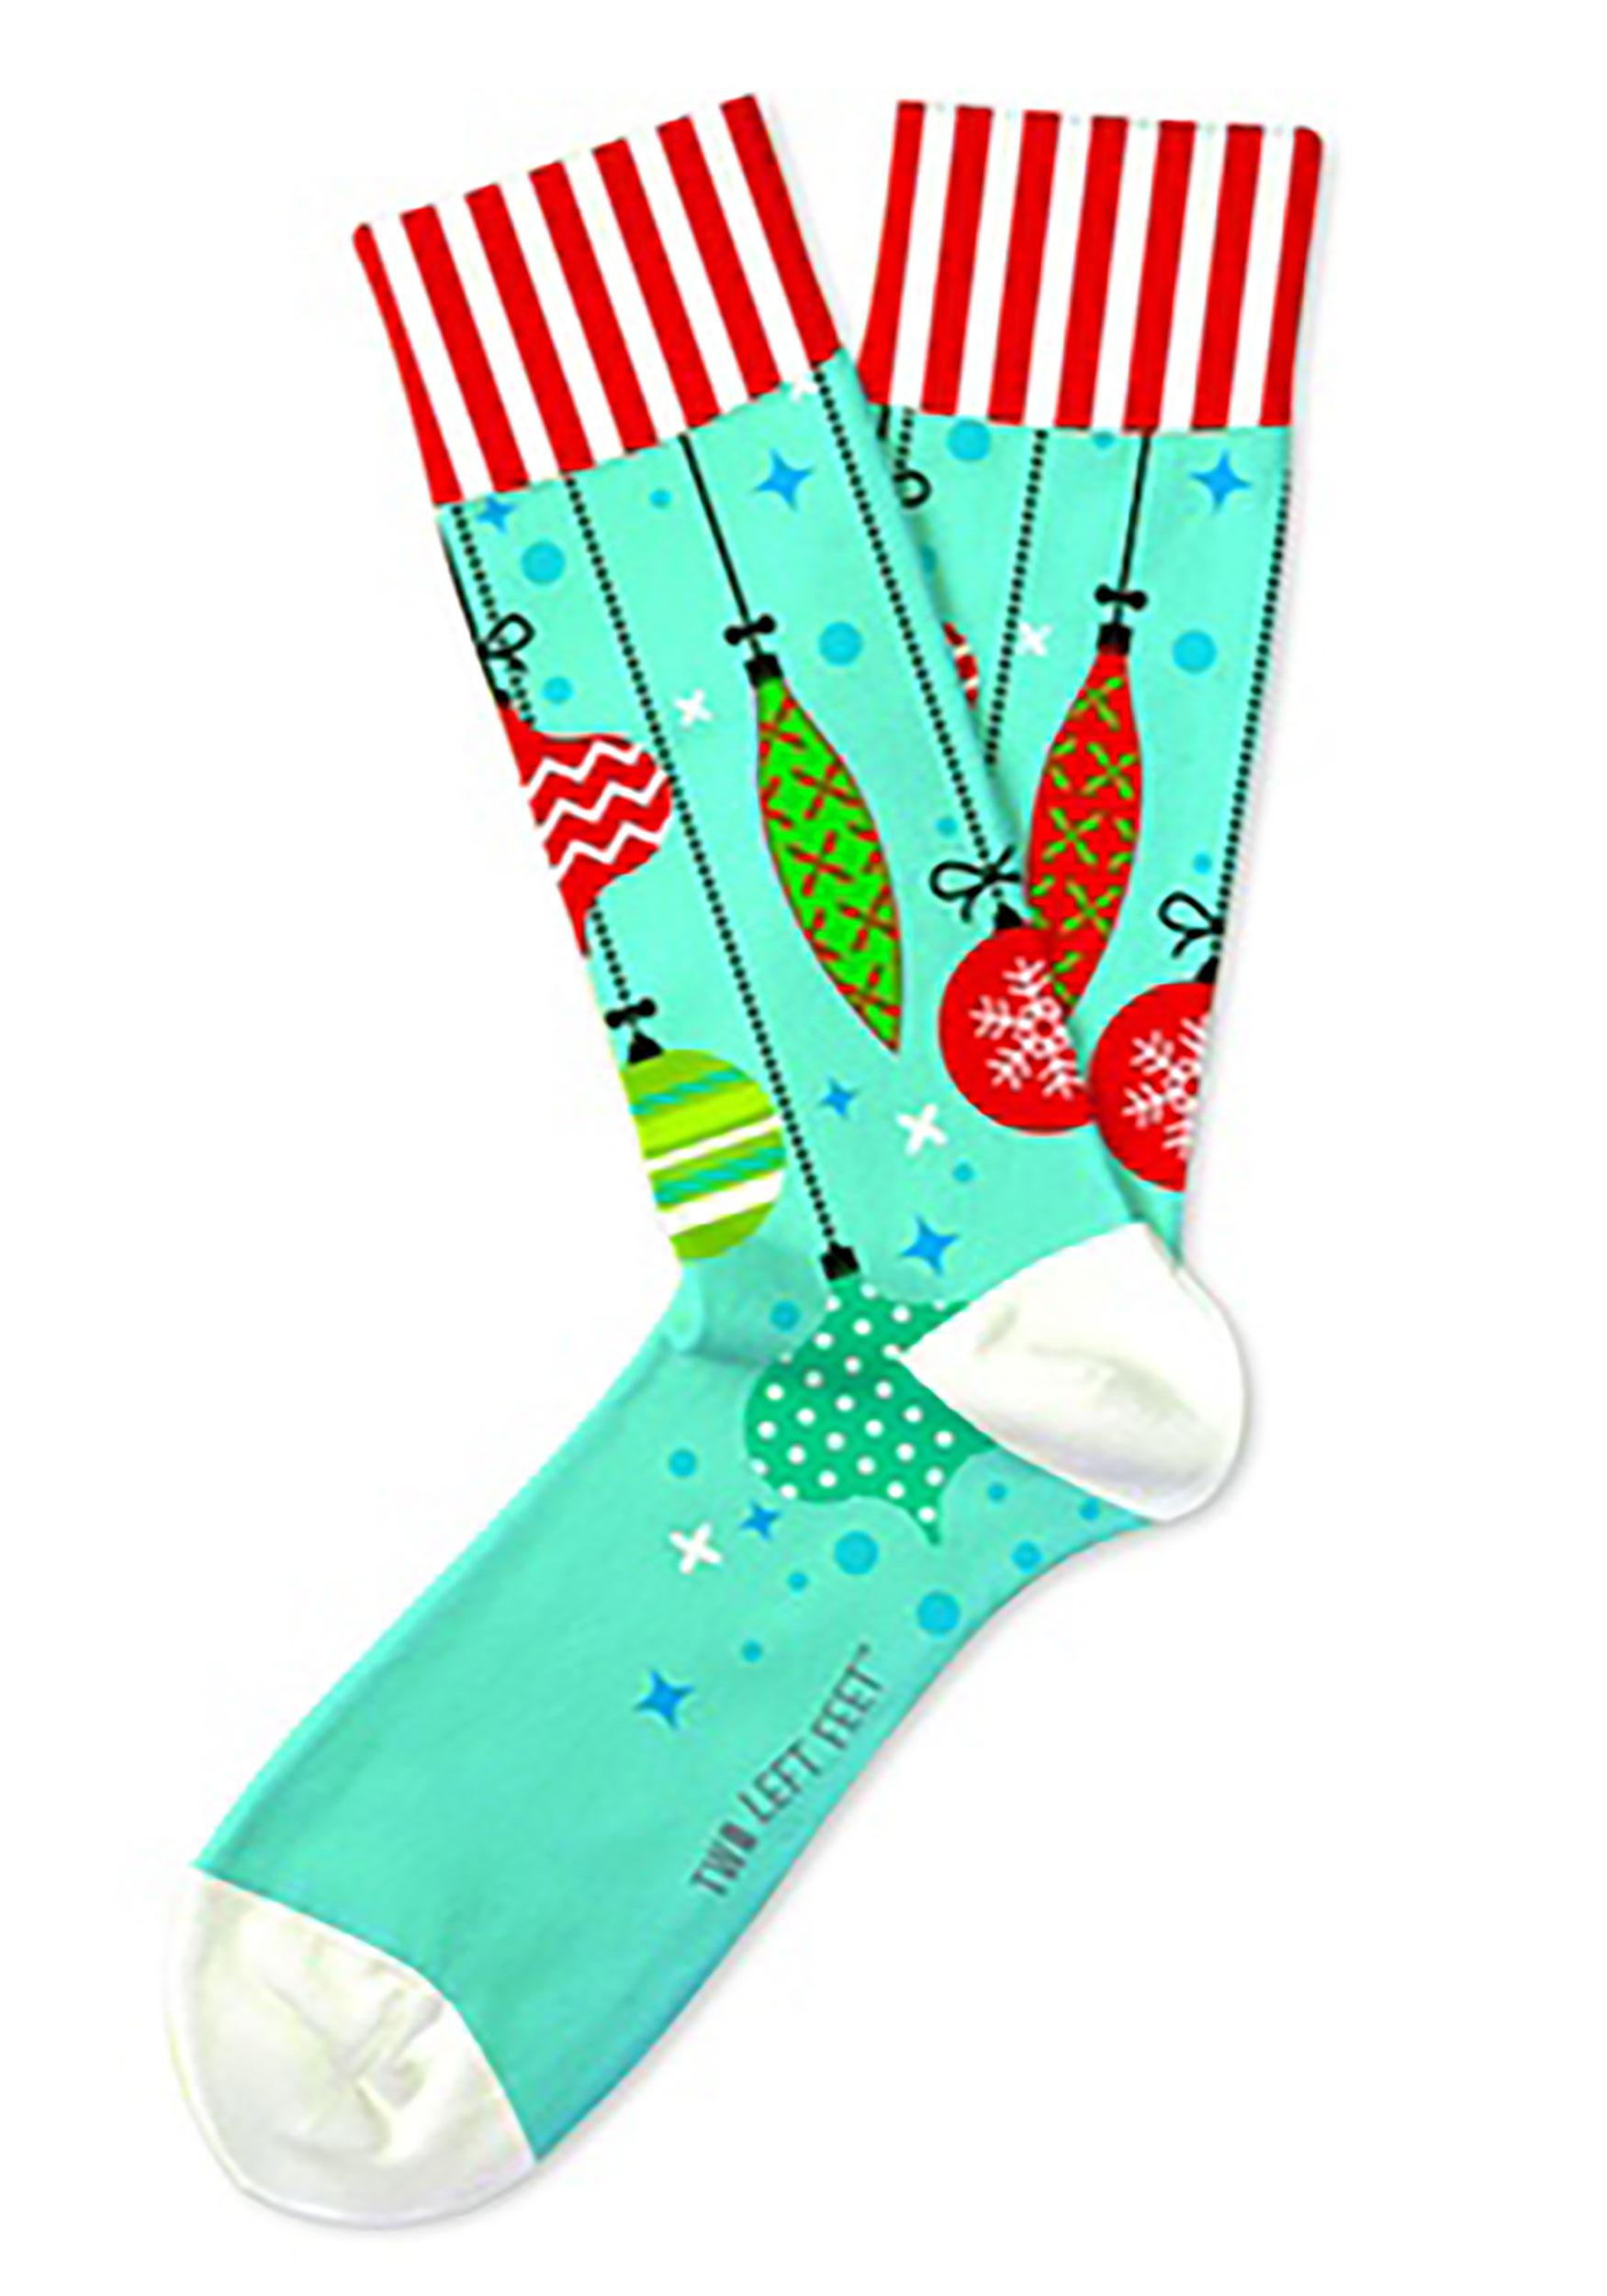 Trim-A-Tree Christmas Ornament Two Left Feet Adult Socks